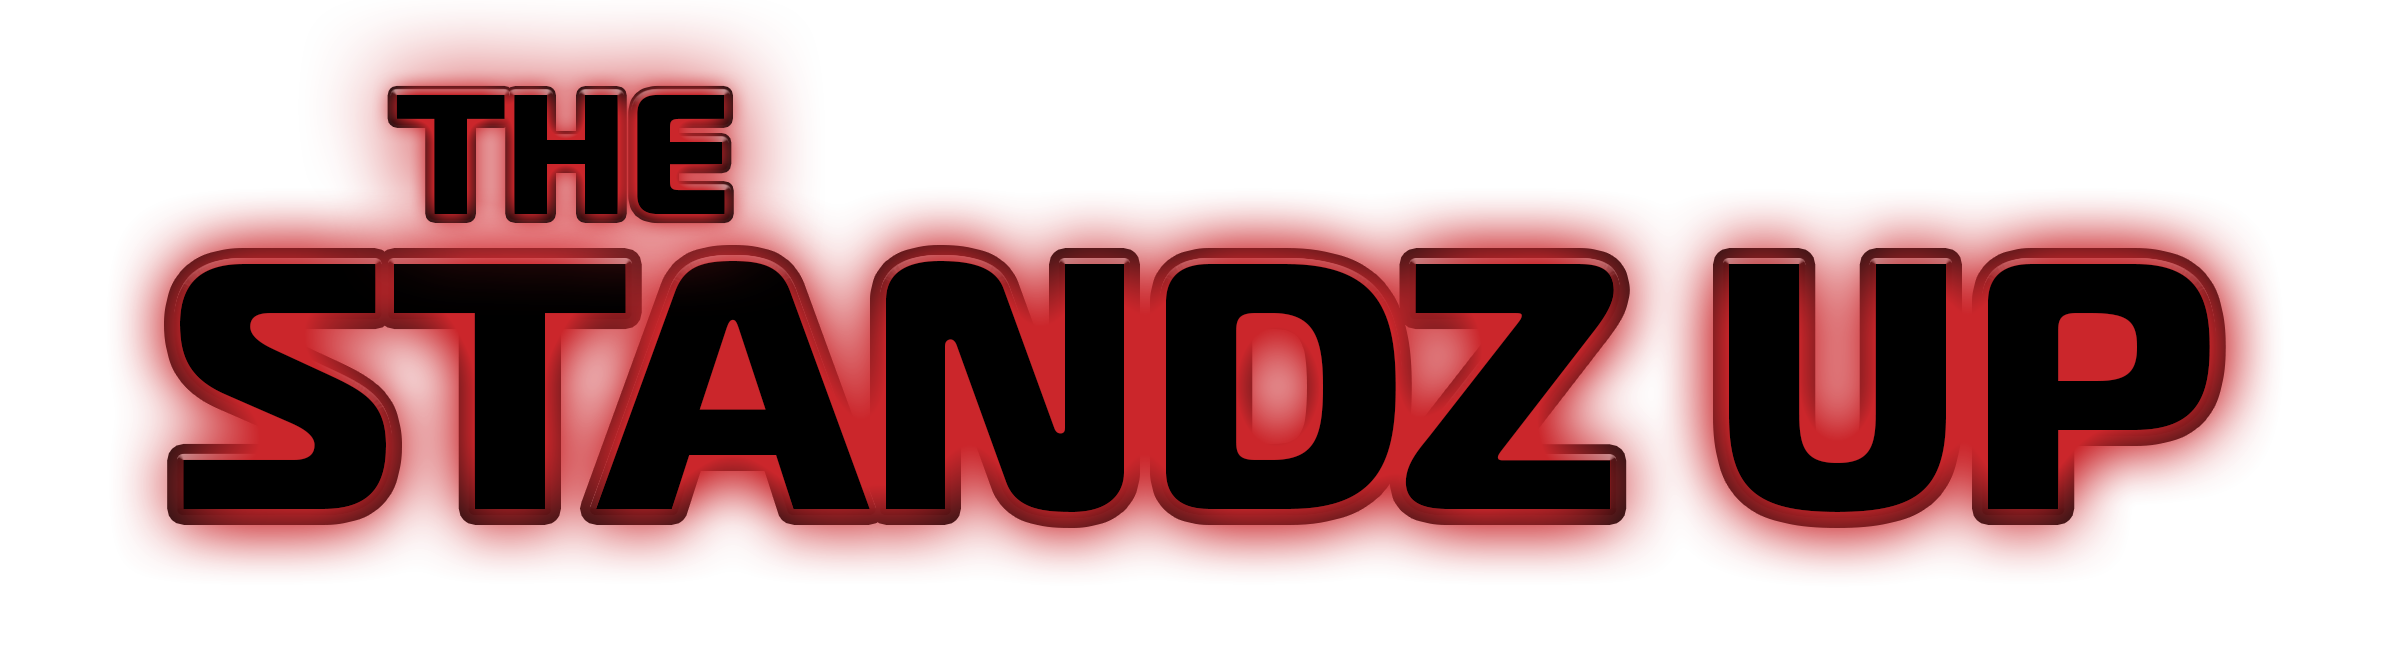 MODEL #PVHA-200 THE STANDZ UP - LADDER STAND HOIST